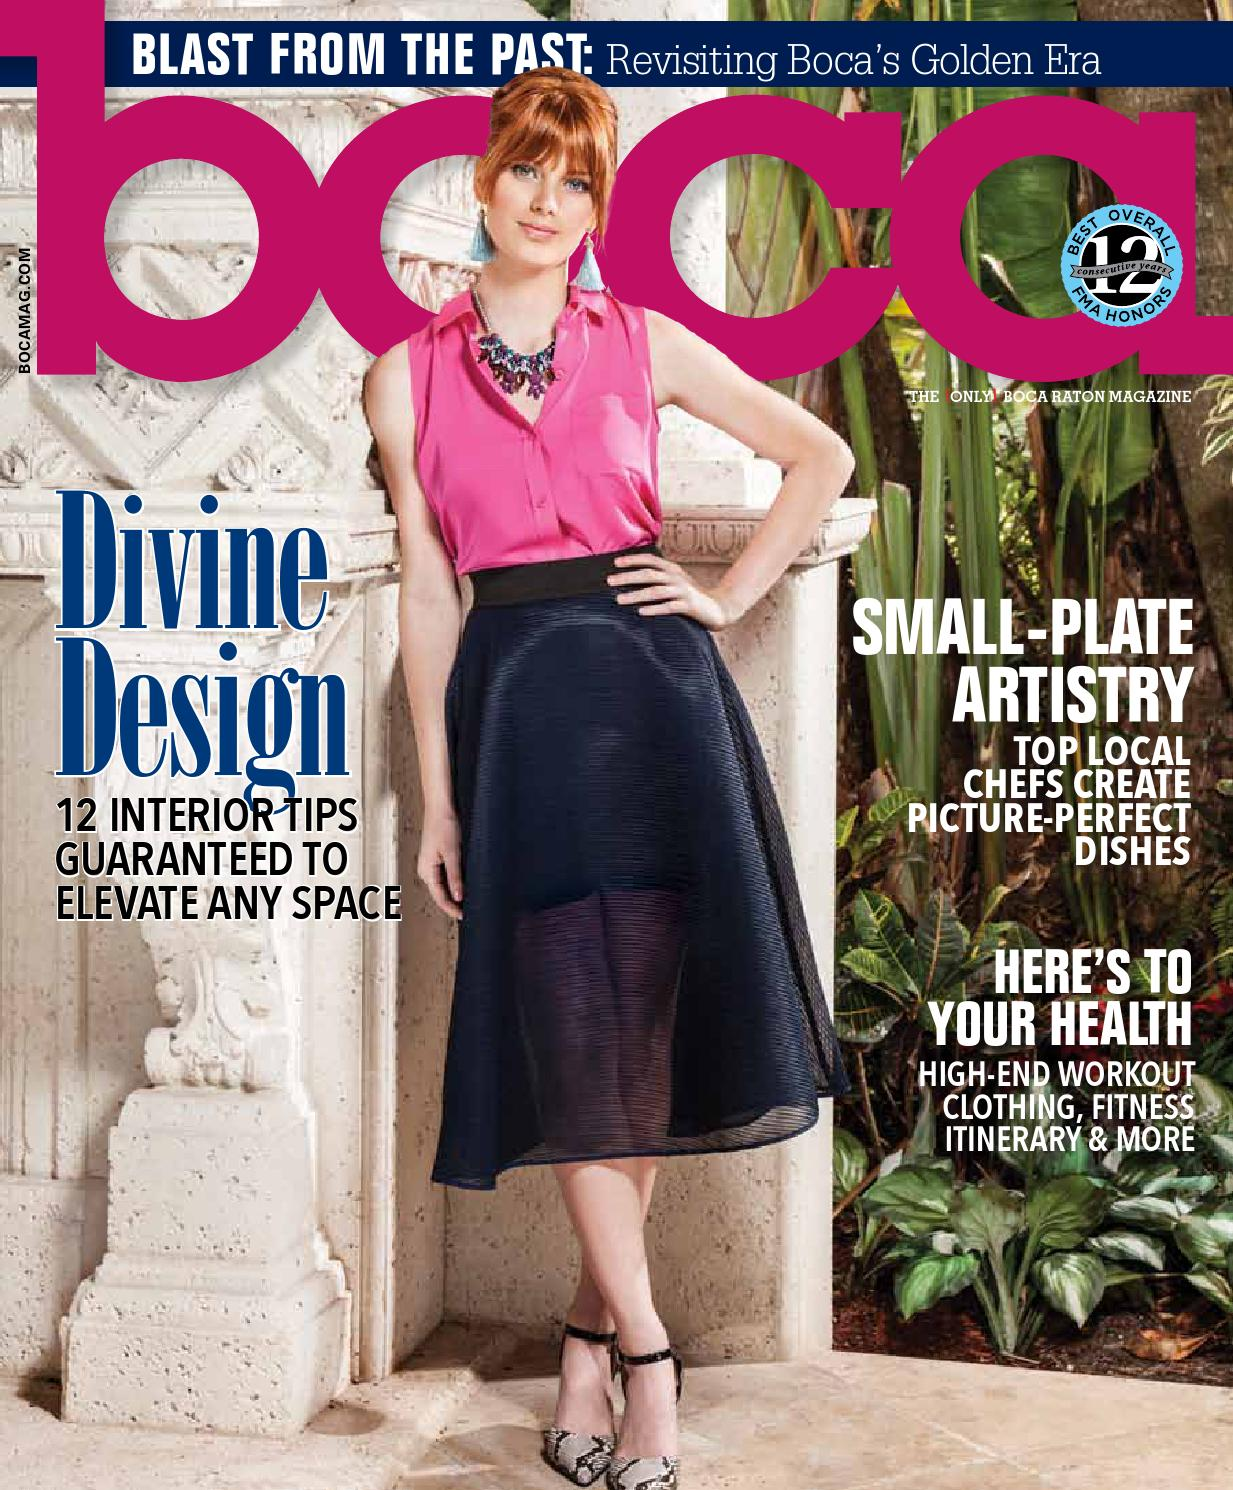 e46b1064ab24 Boca Raton Magazine May June 2015 by JES Media - issuu